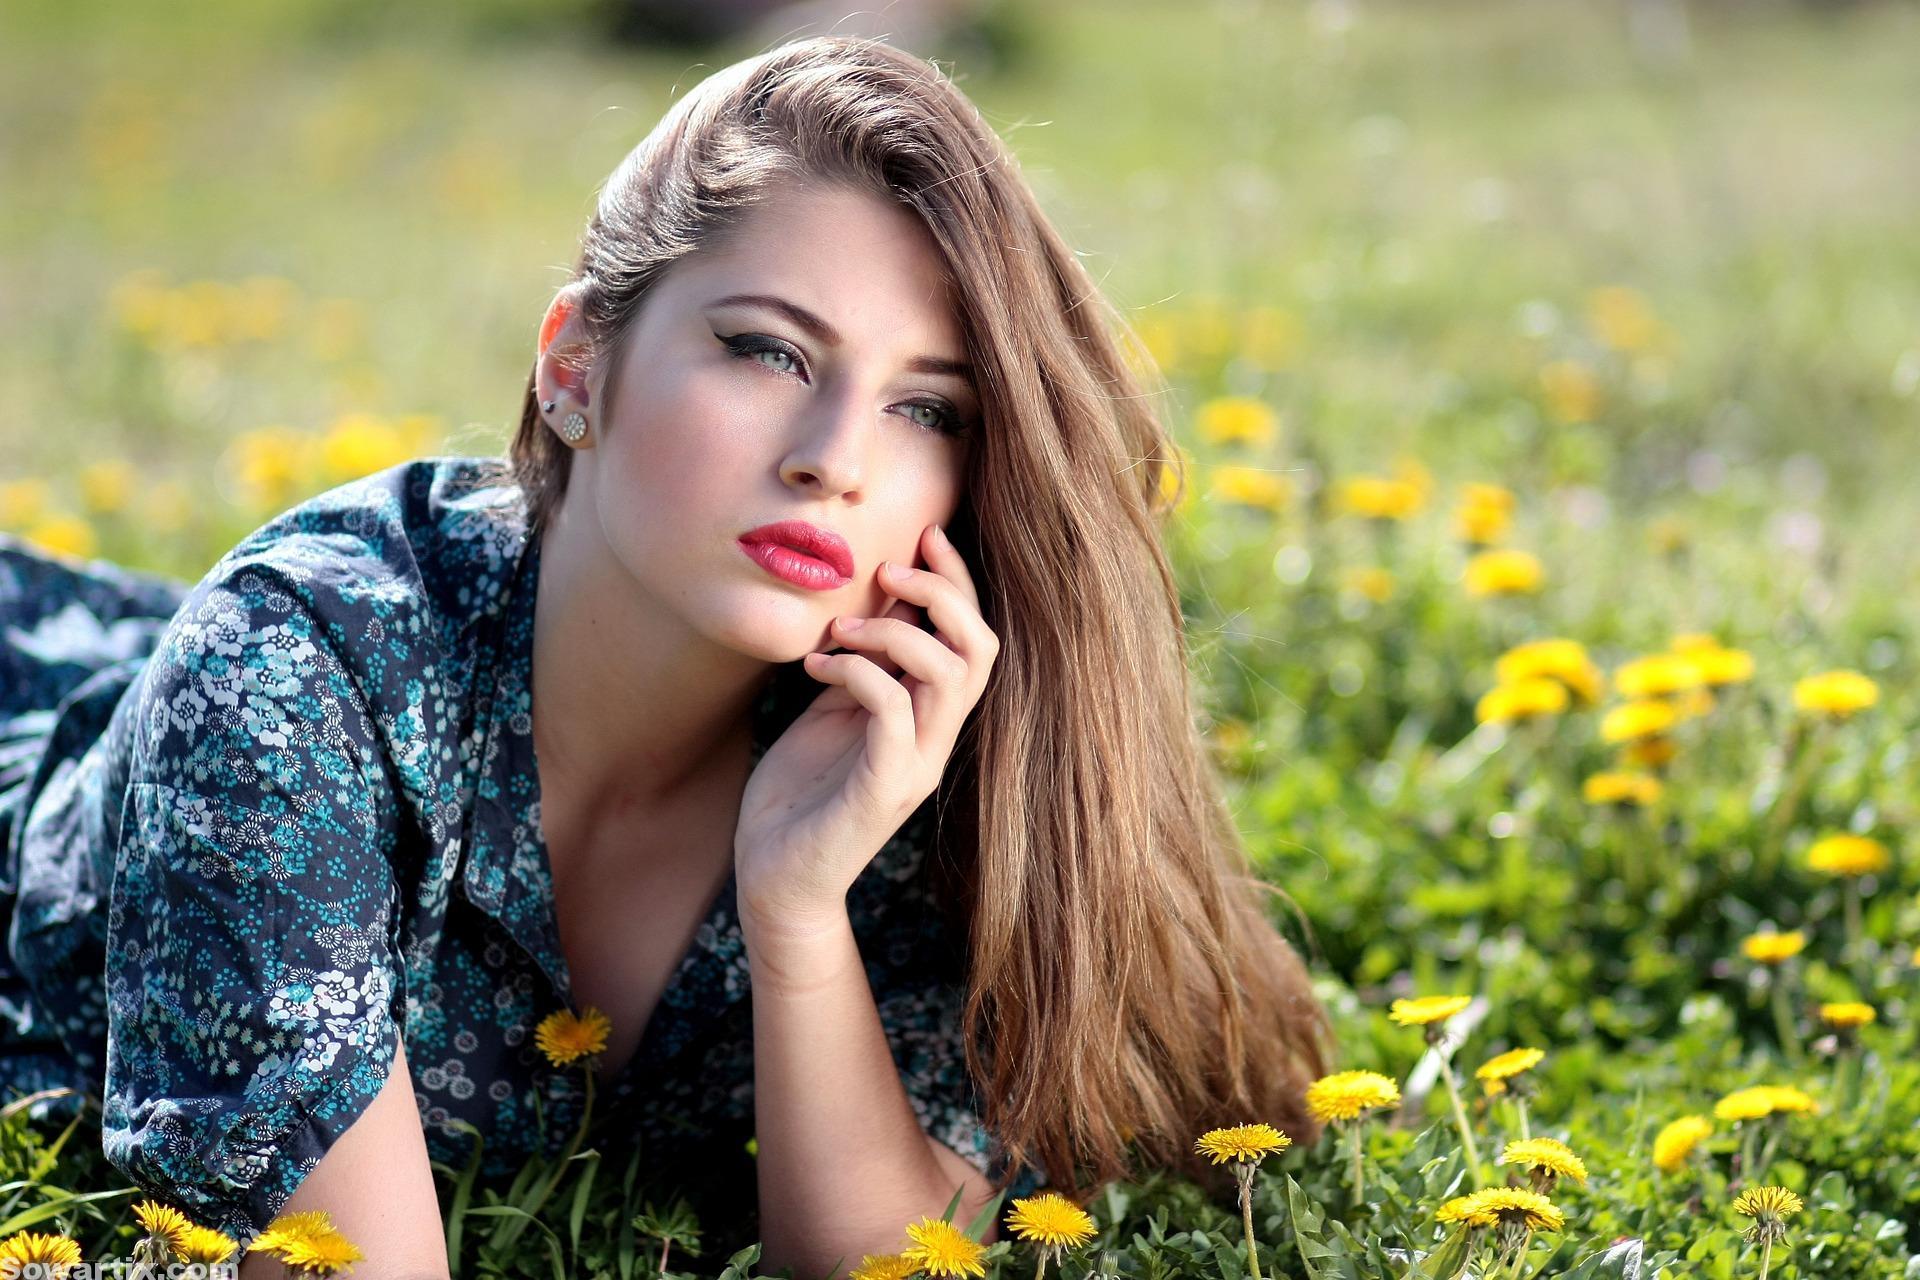 بالصور صور نسوان , اجمل صور للنساء 3462 4